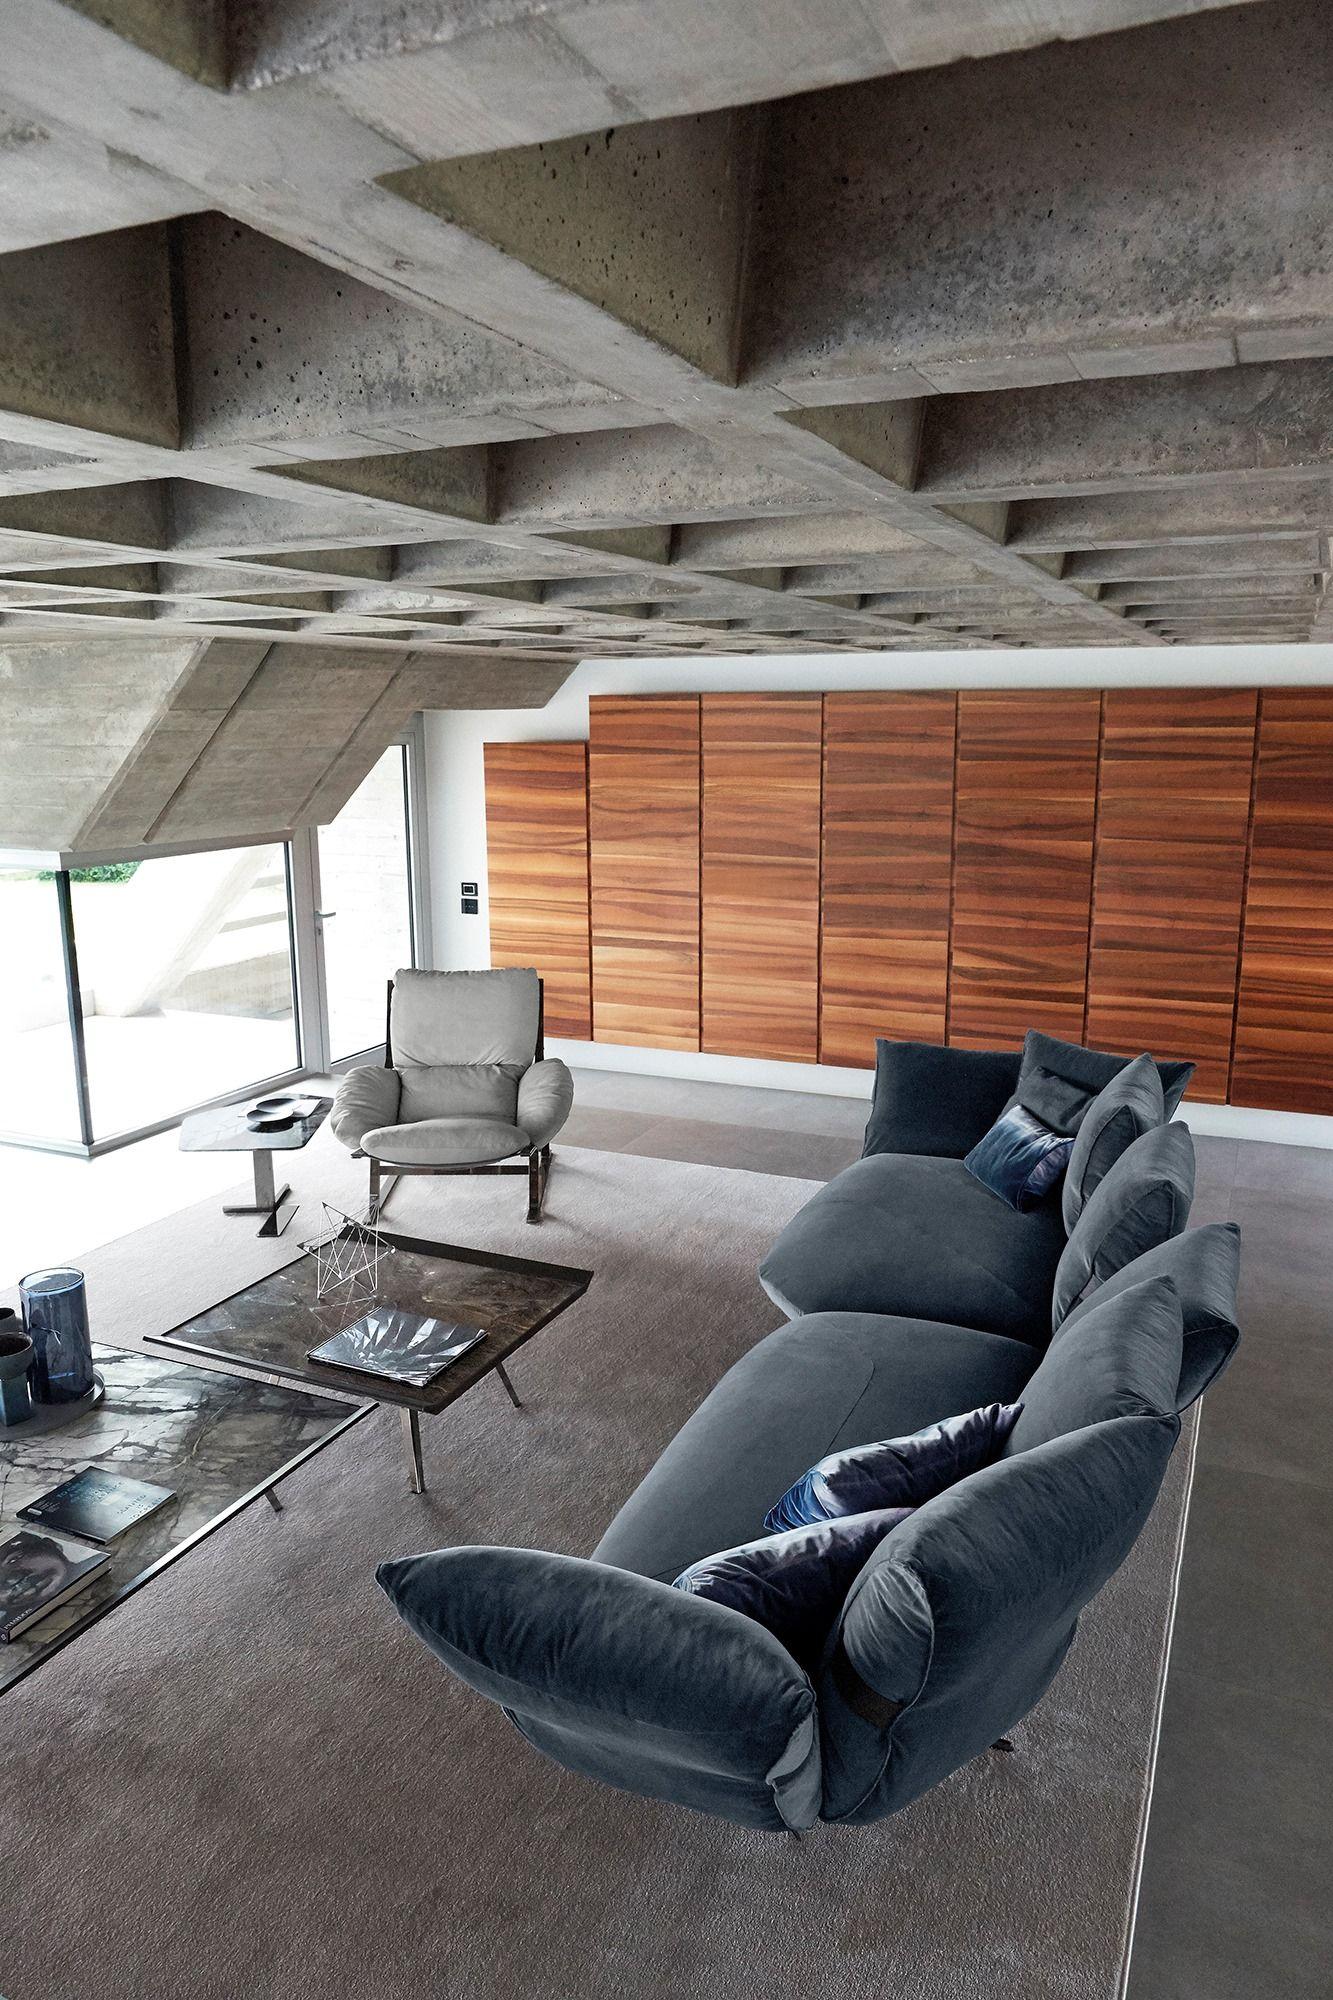 Arketipo We Used Design To Define A Contemporary Designers Furniture Italian Interior Design Sofa Design Luxury Furniture Brands